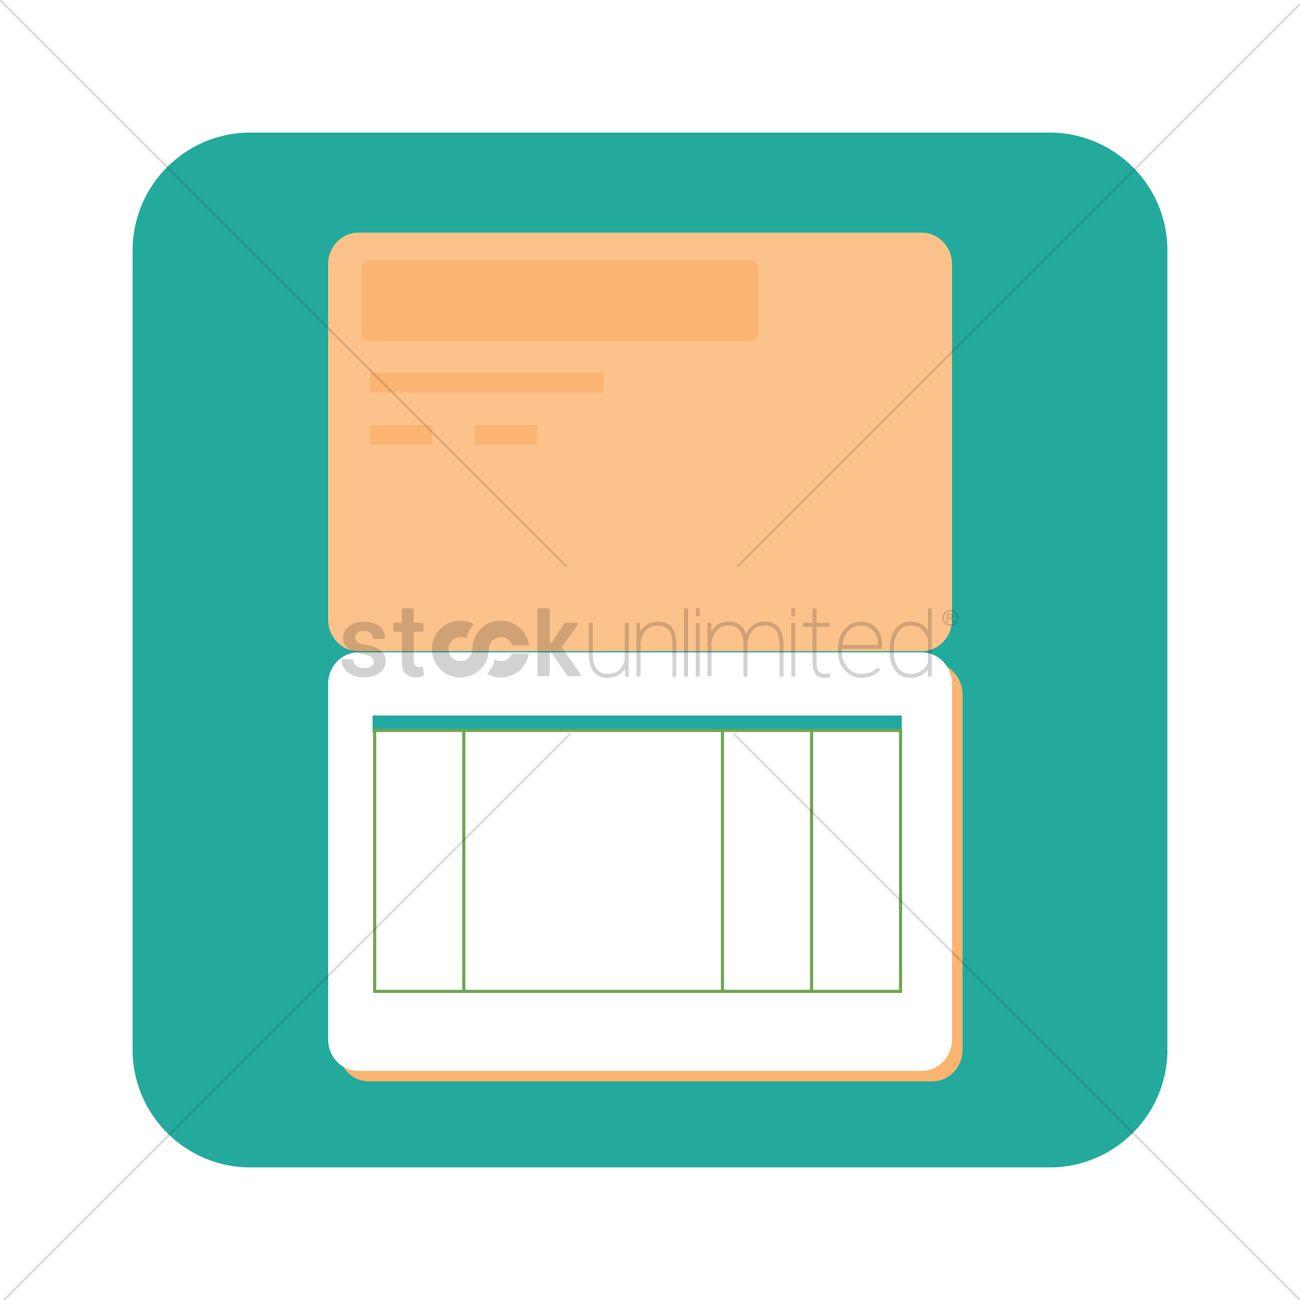 Free Savings book Vector Image.